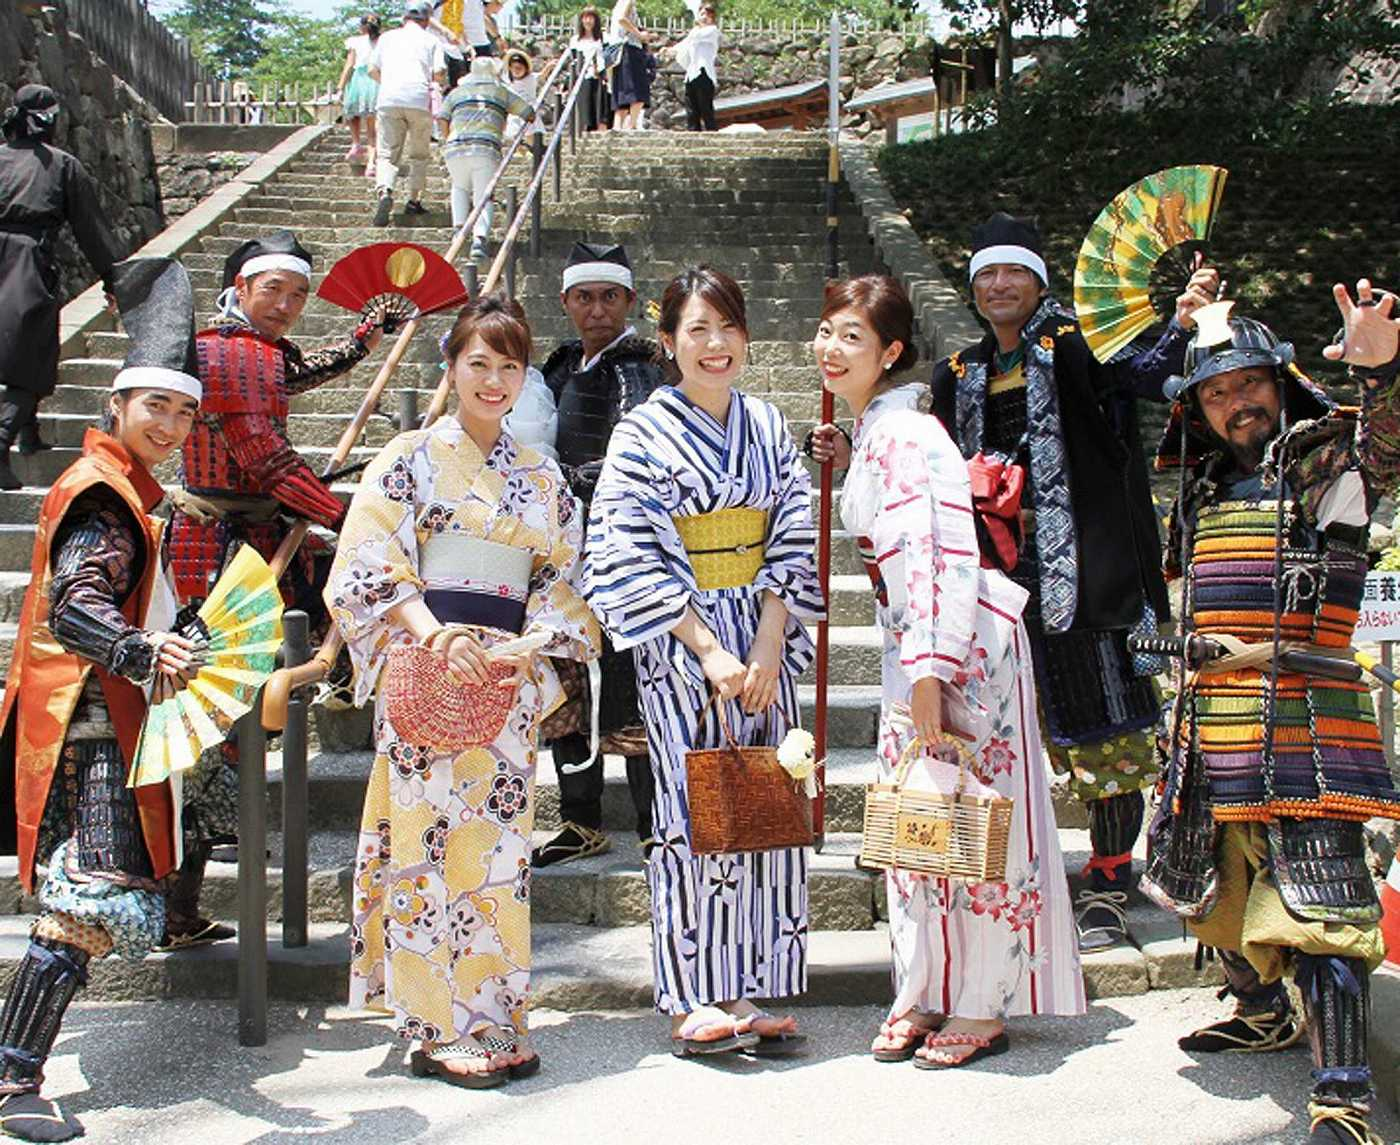 Rental Kimono and city strolling